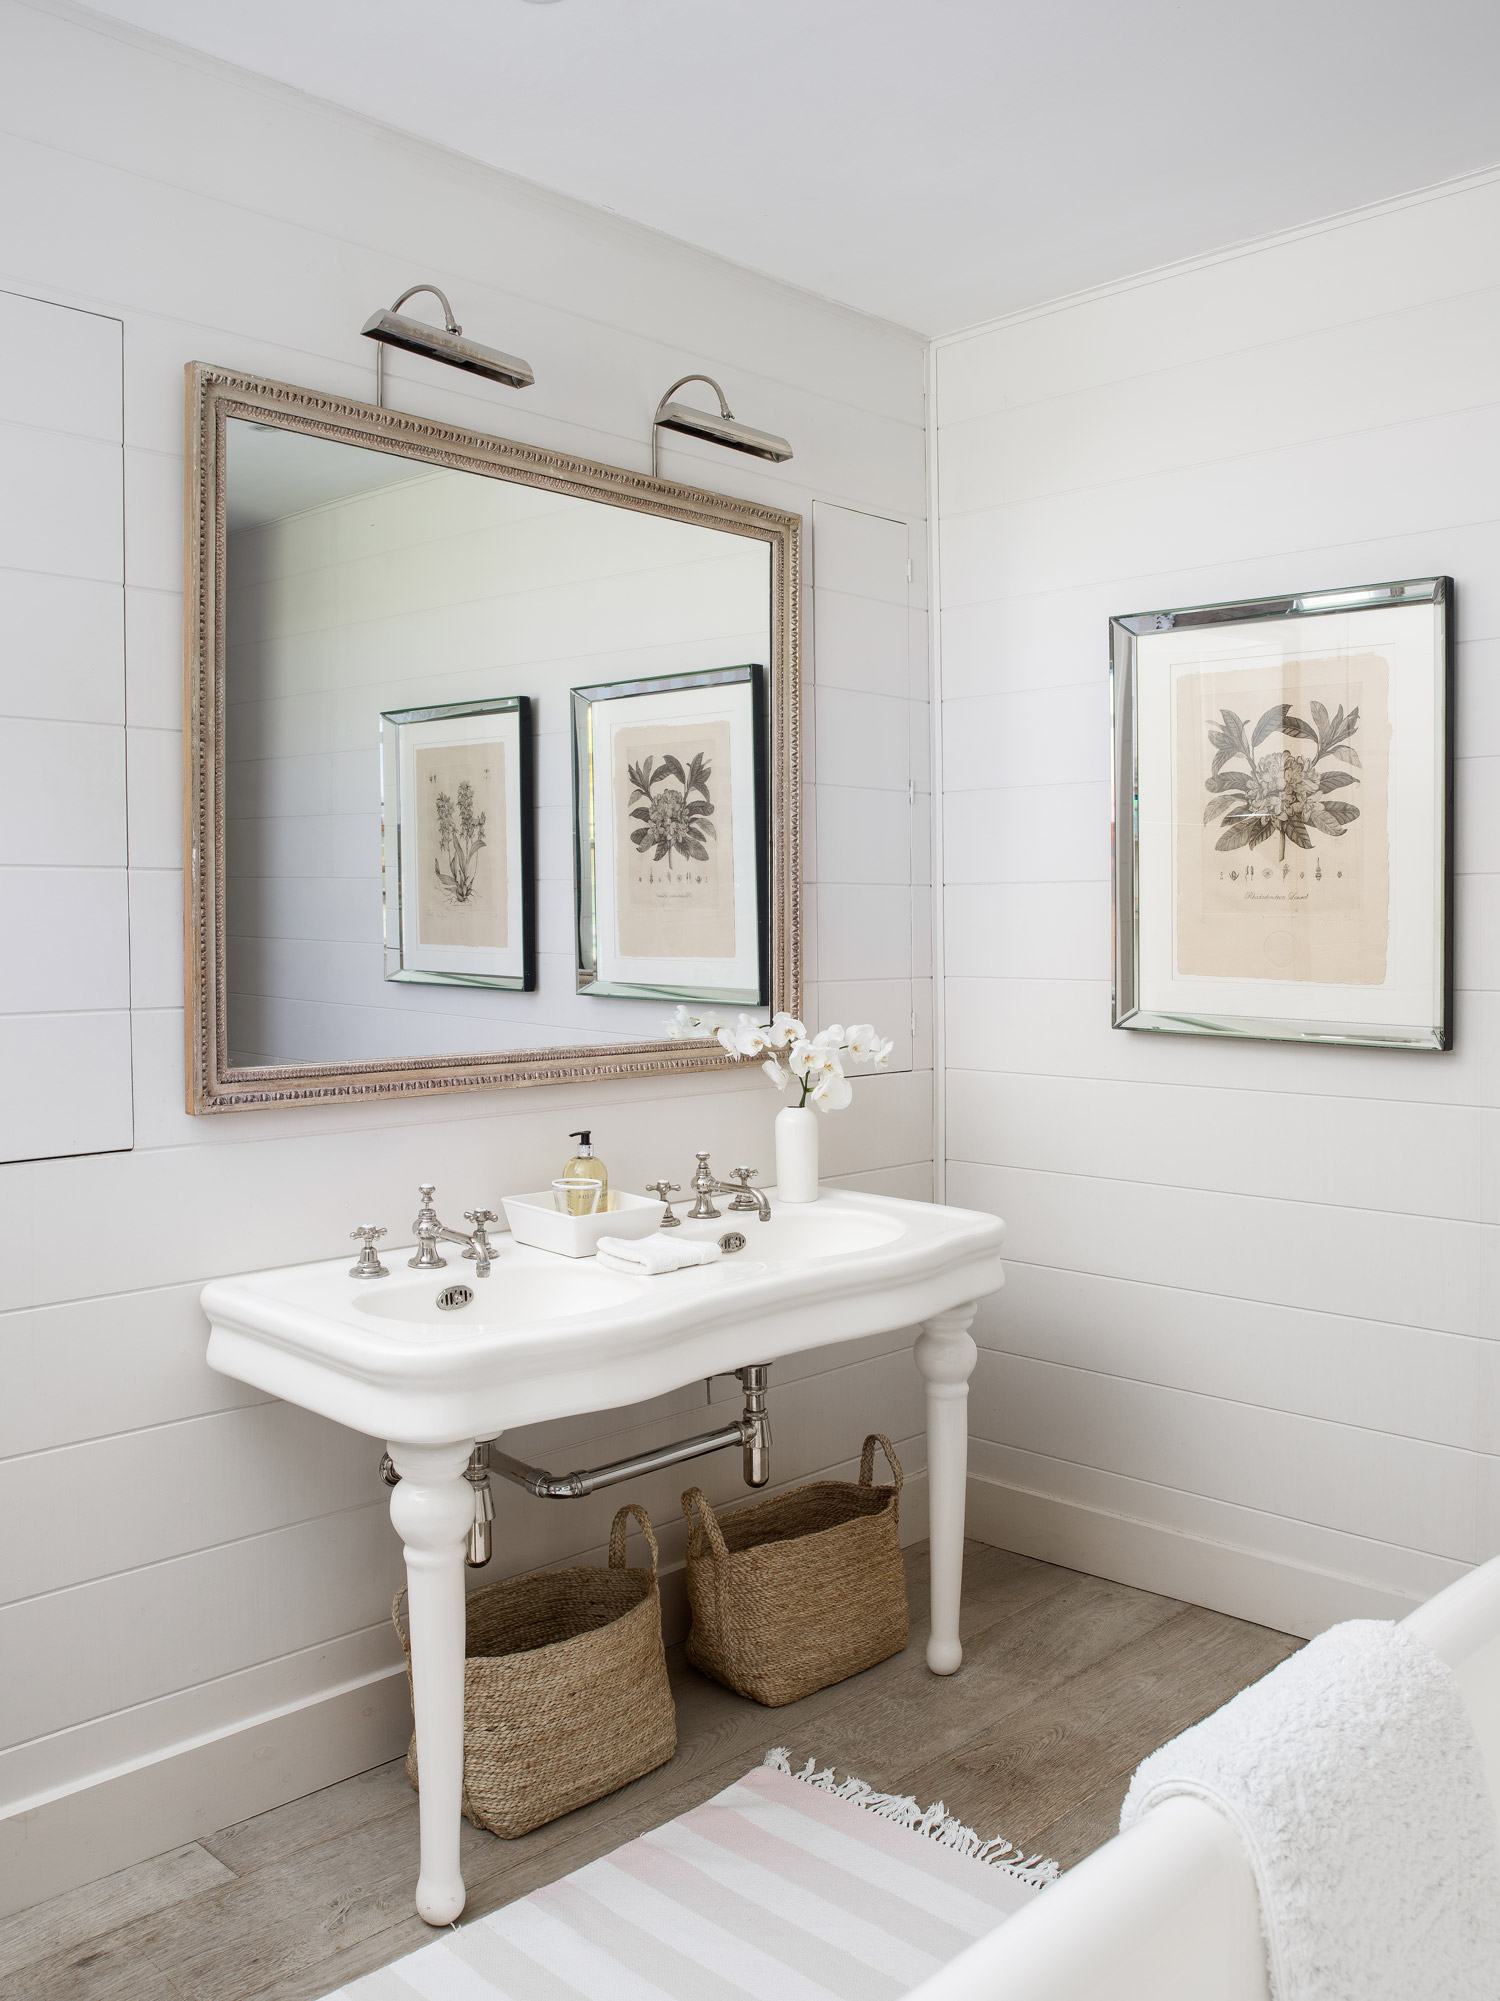 Sink  – interior design by Eadie & Crole